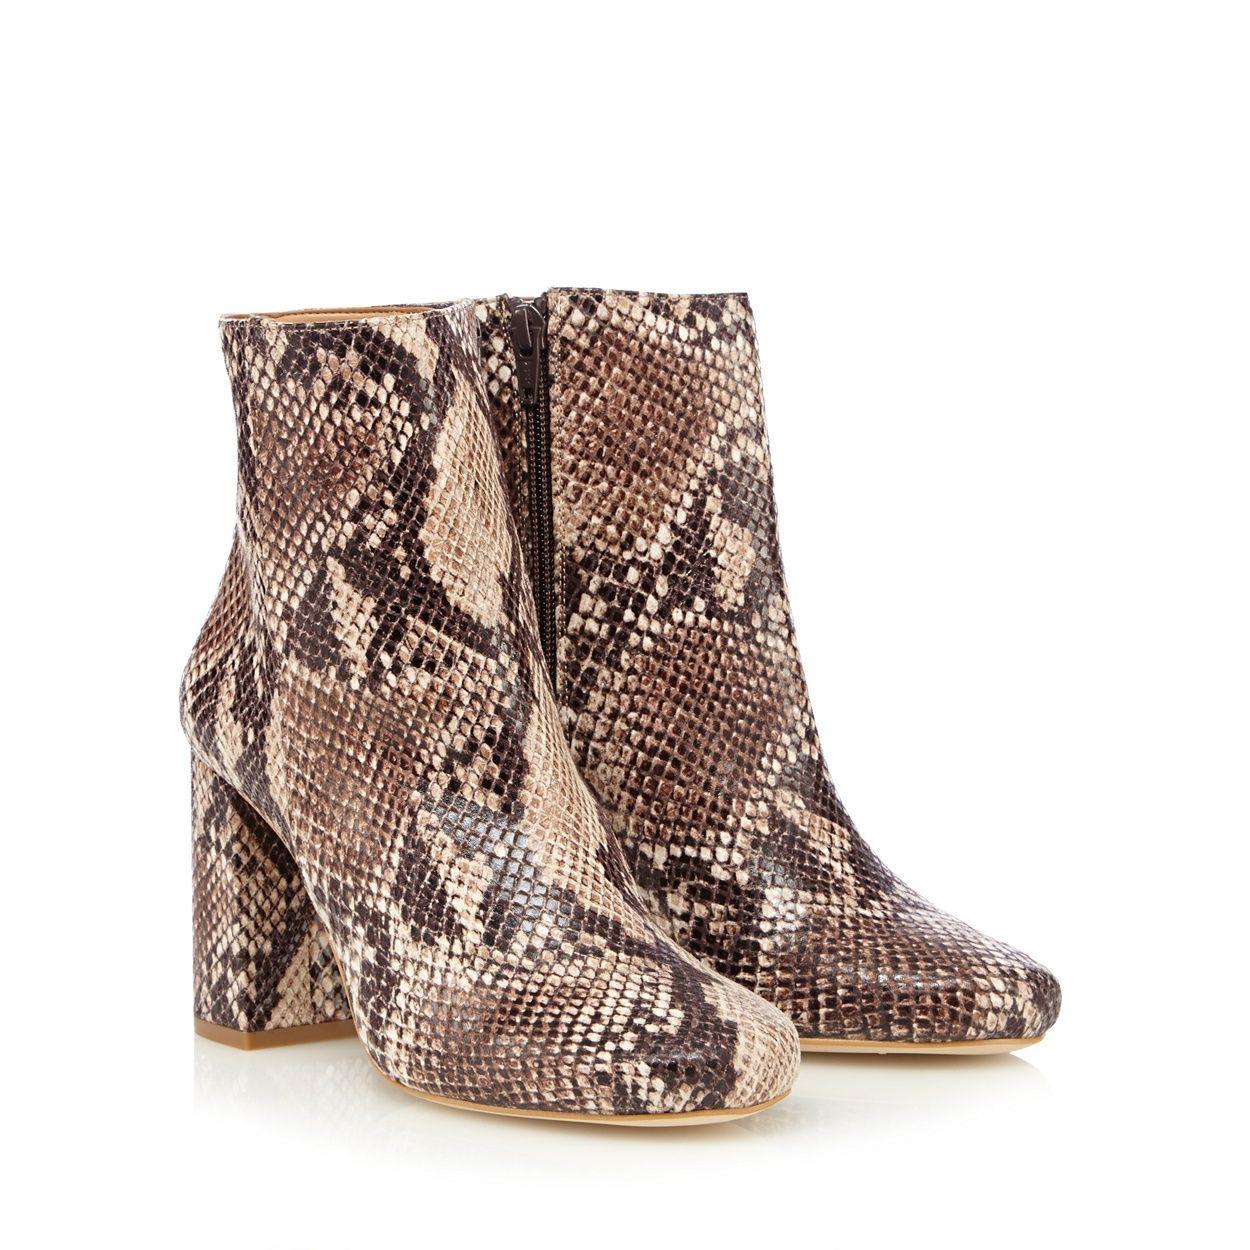 89192d179f4 Faith Natural snakeskin effect high ankle boots- at Debenhams.com ...